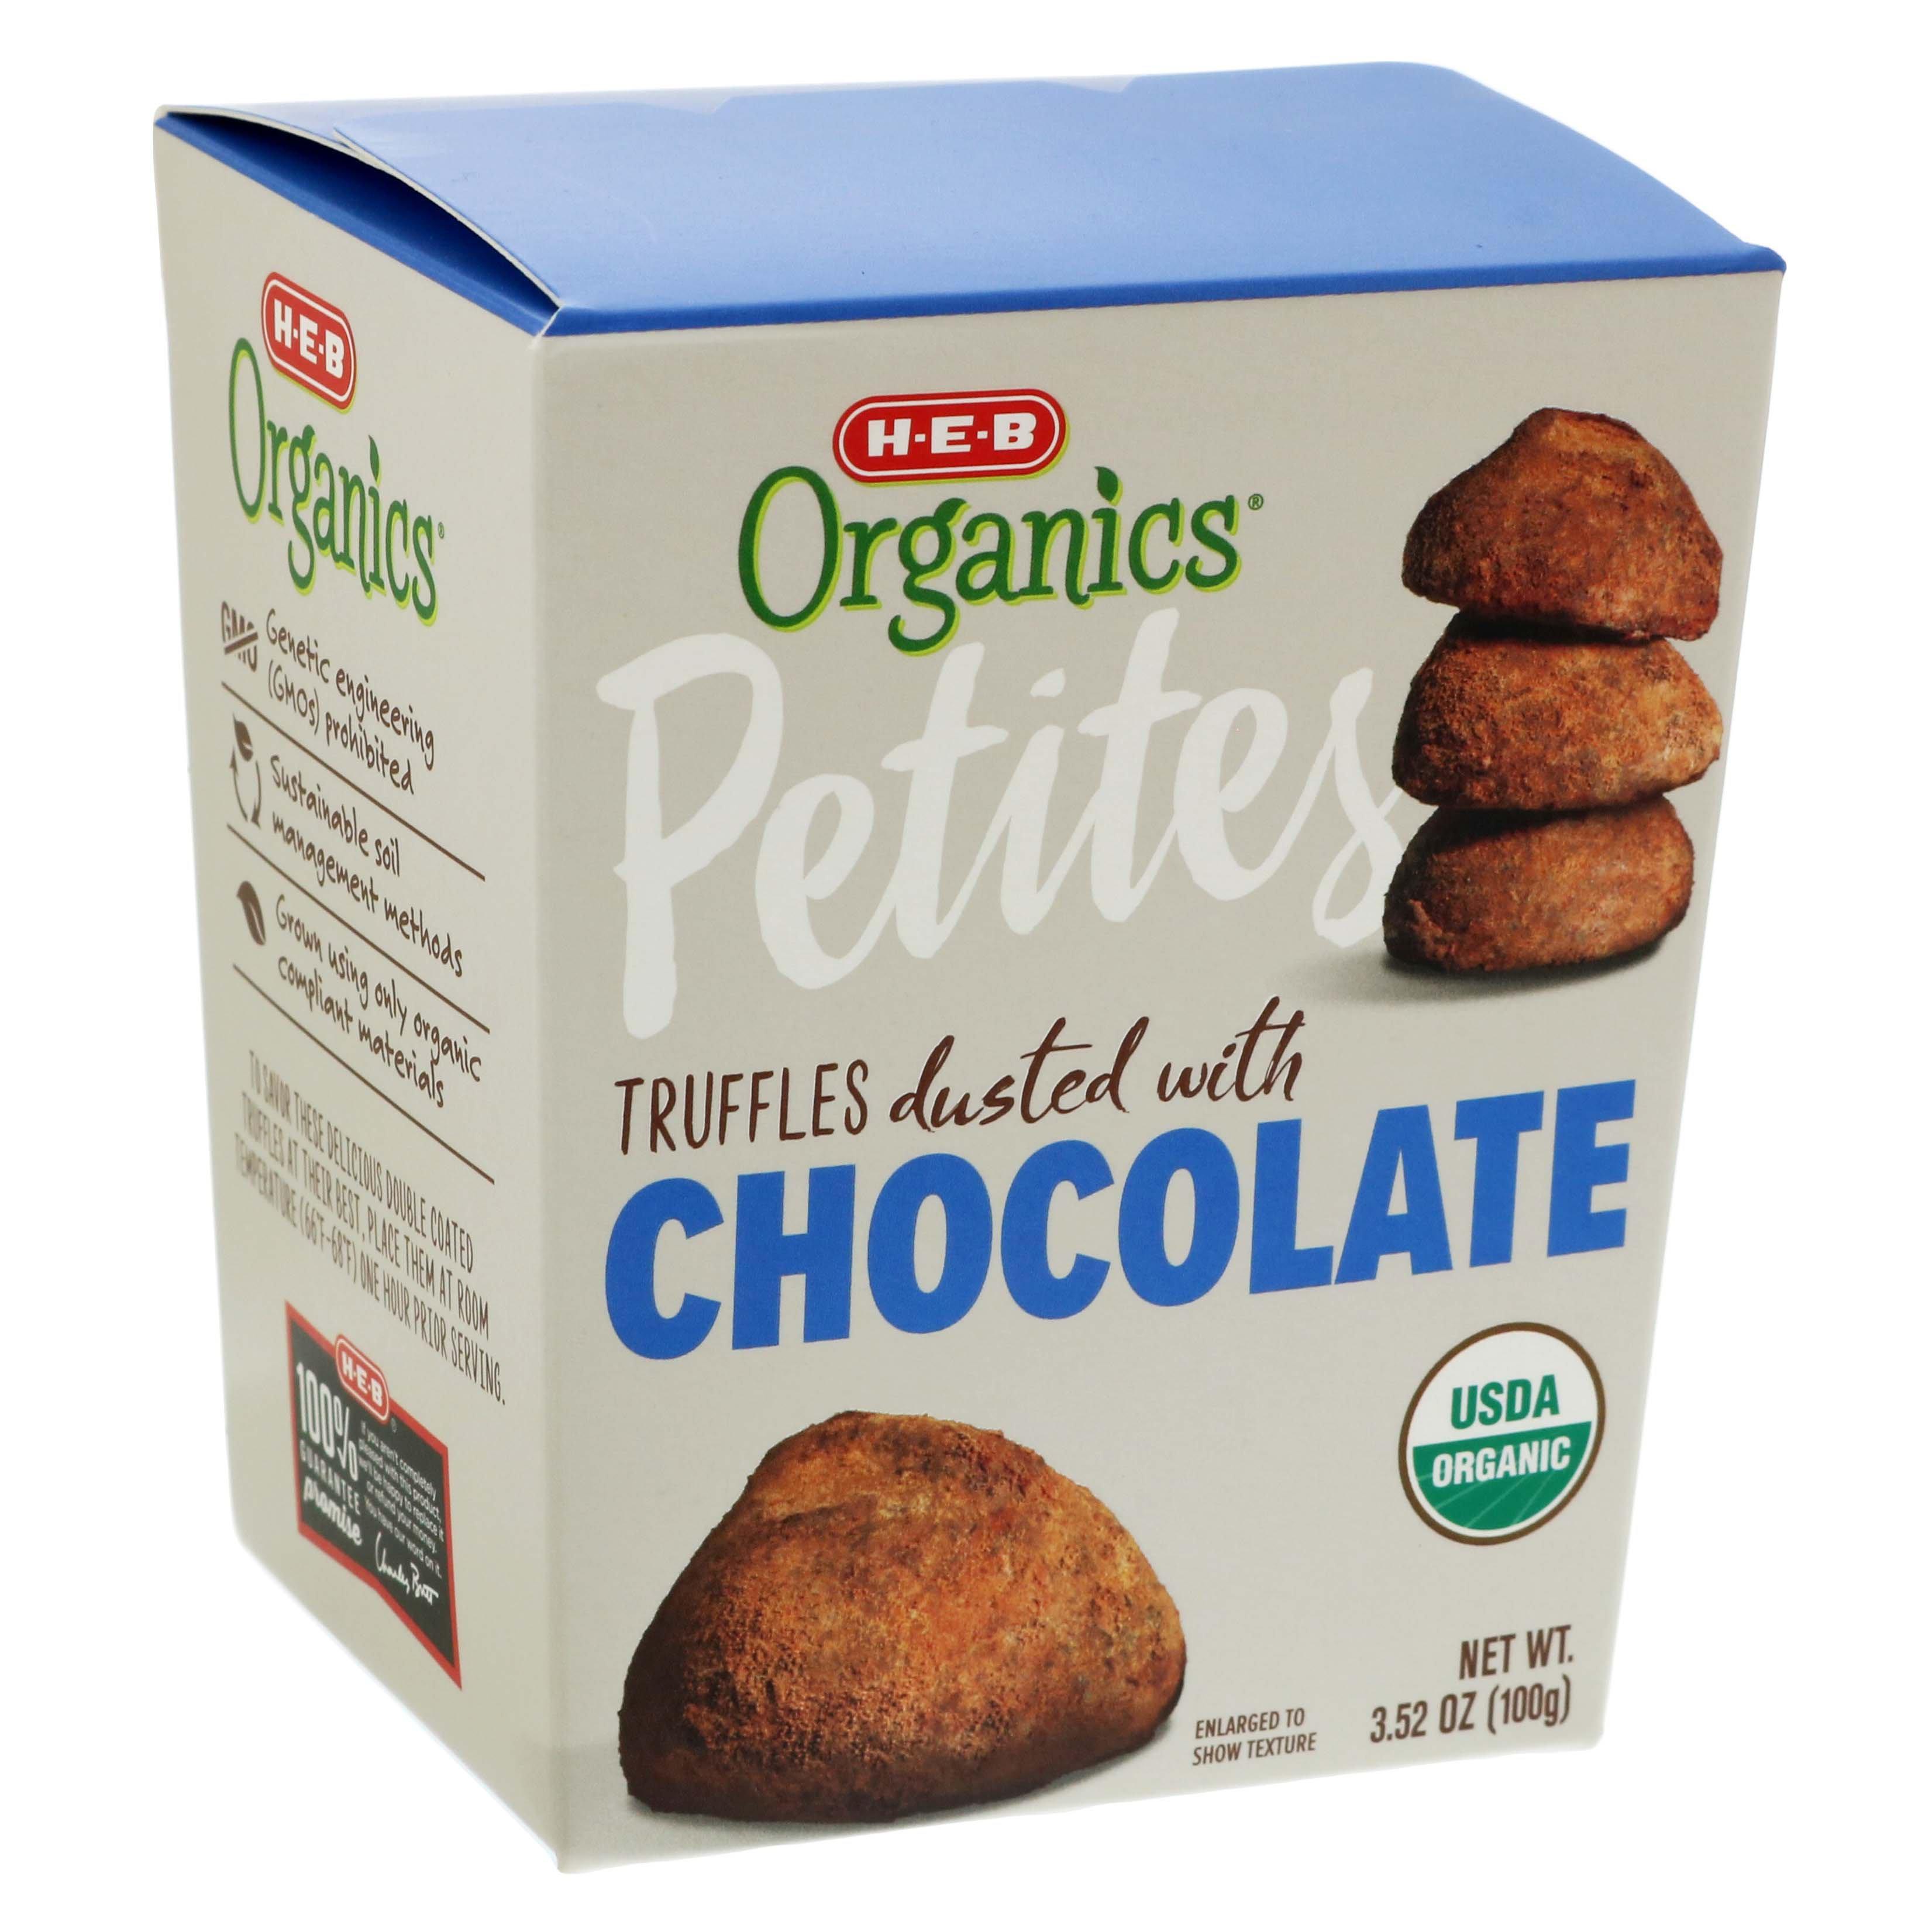 H‑E‑B Organic Chocolate Truffles ‑ Shop Candy at H‑E‑B